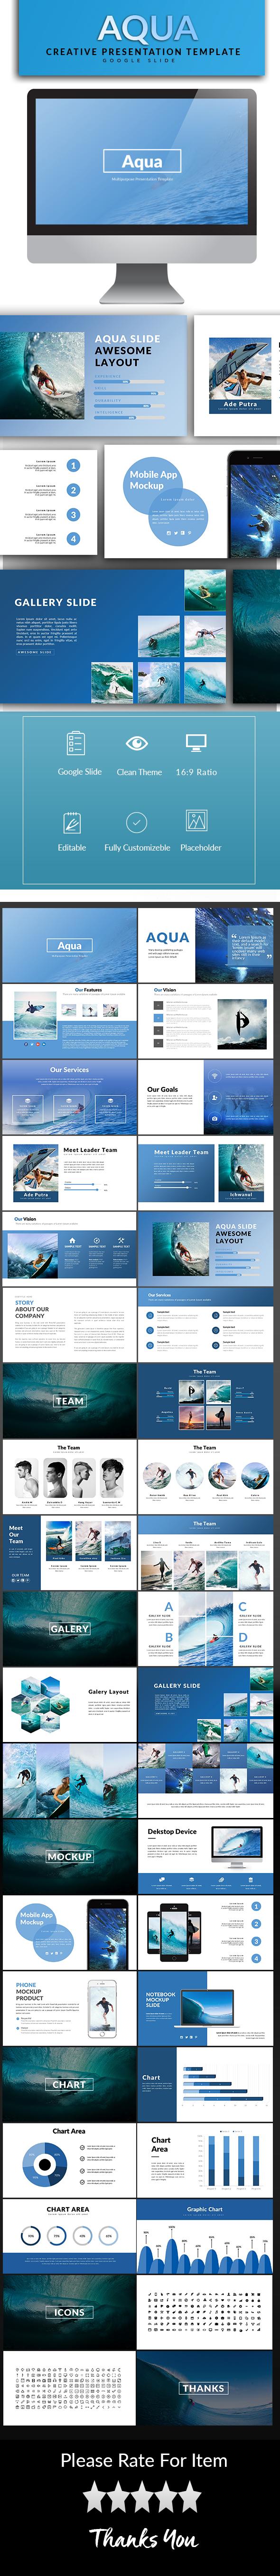 Aqua Google Slide Template - Google Slides Presentation Templates